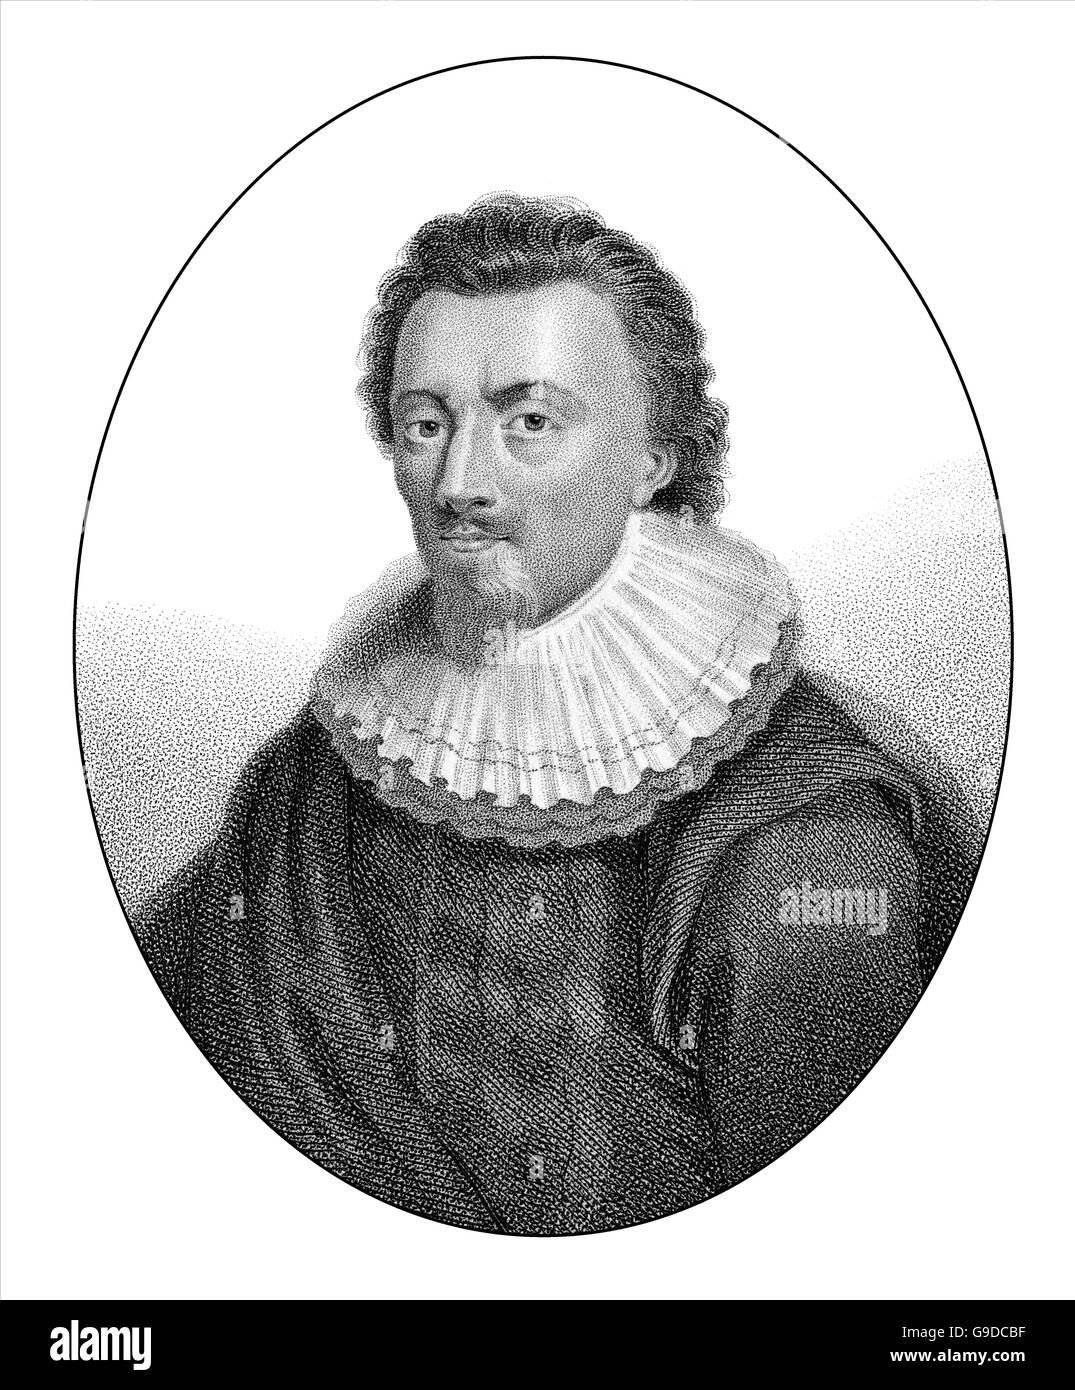 George Calvert, 1st Baron Baltimore, 1579-1631, an English politician and  colonizer